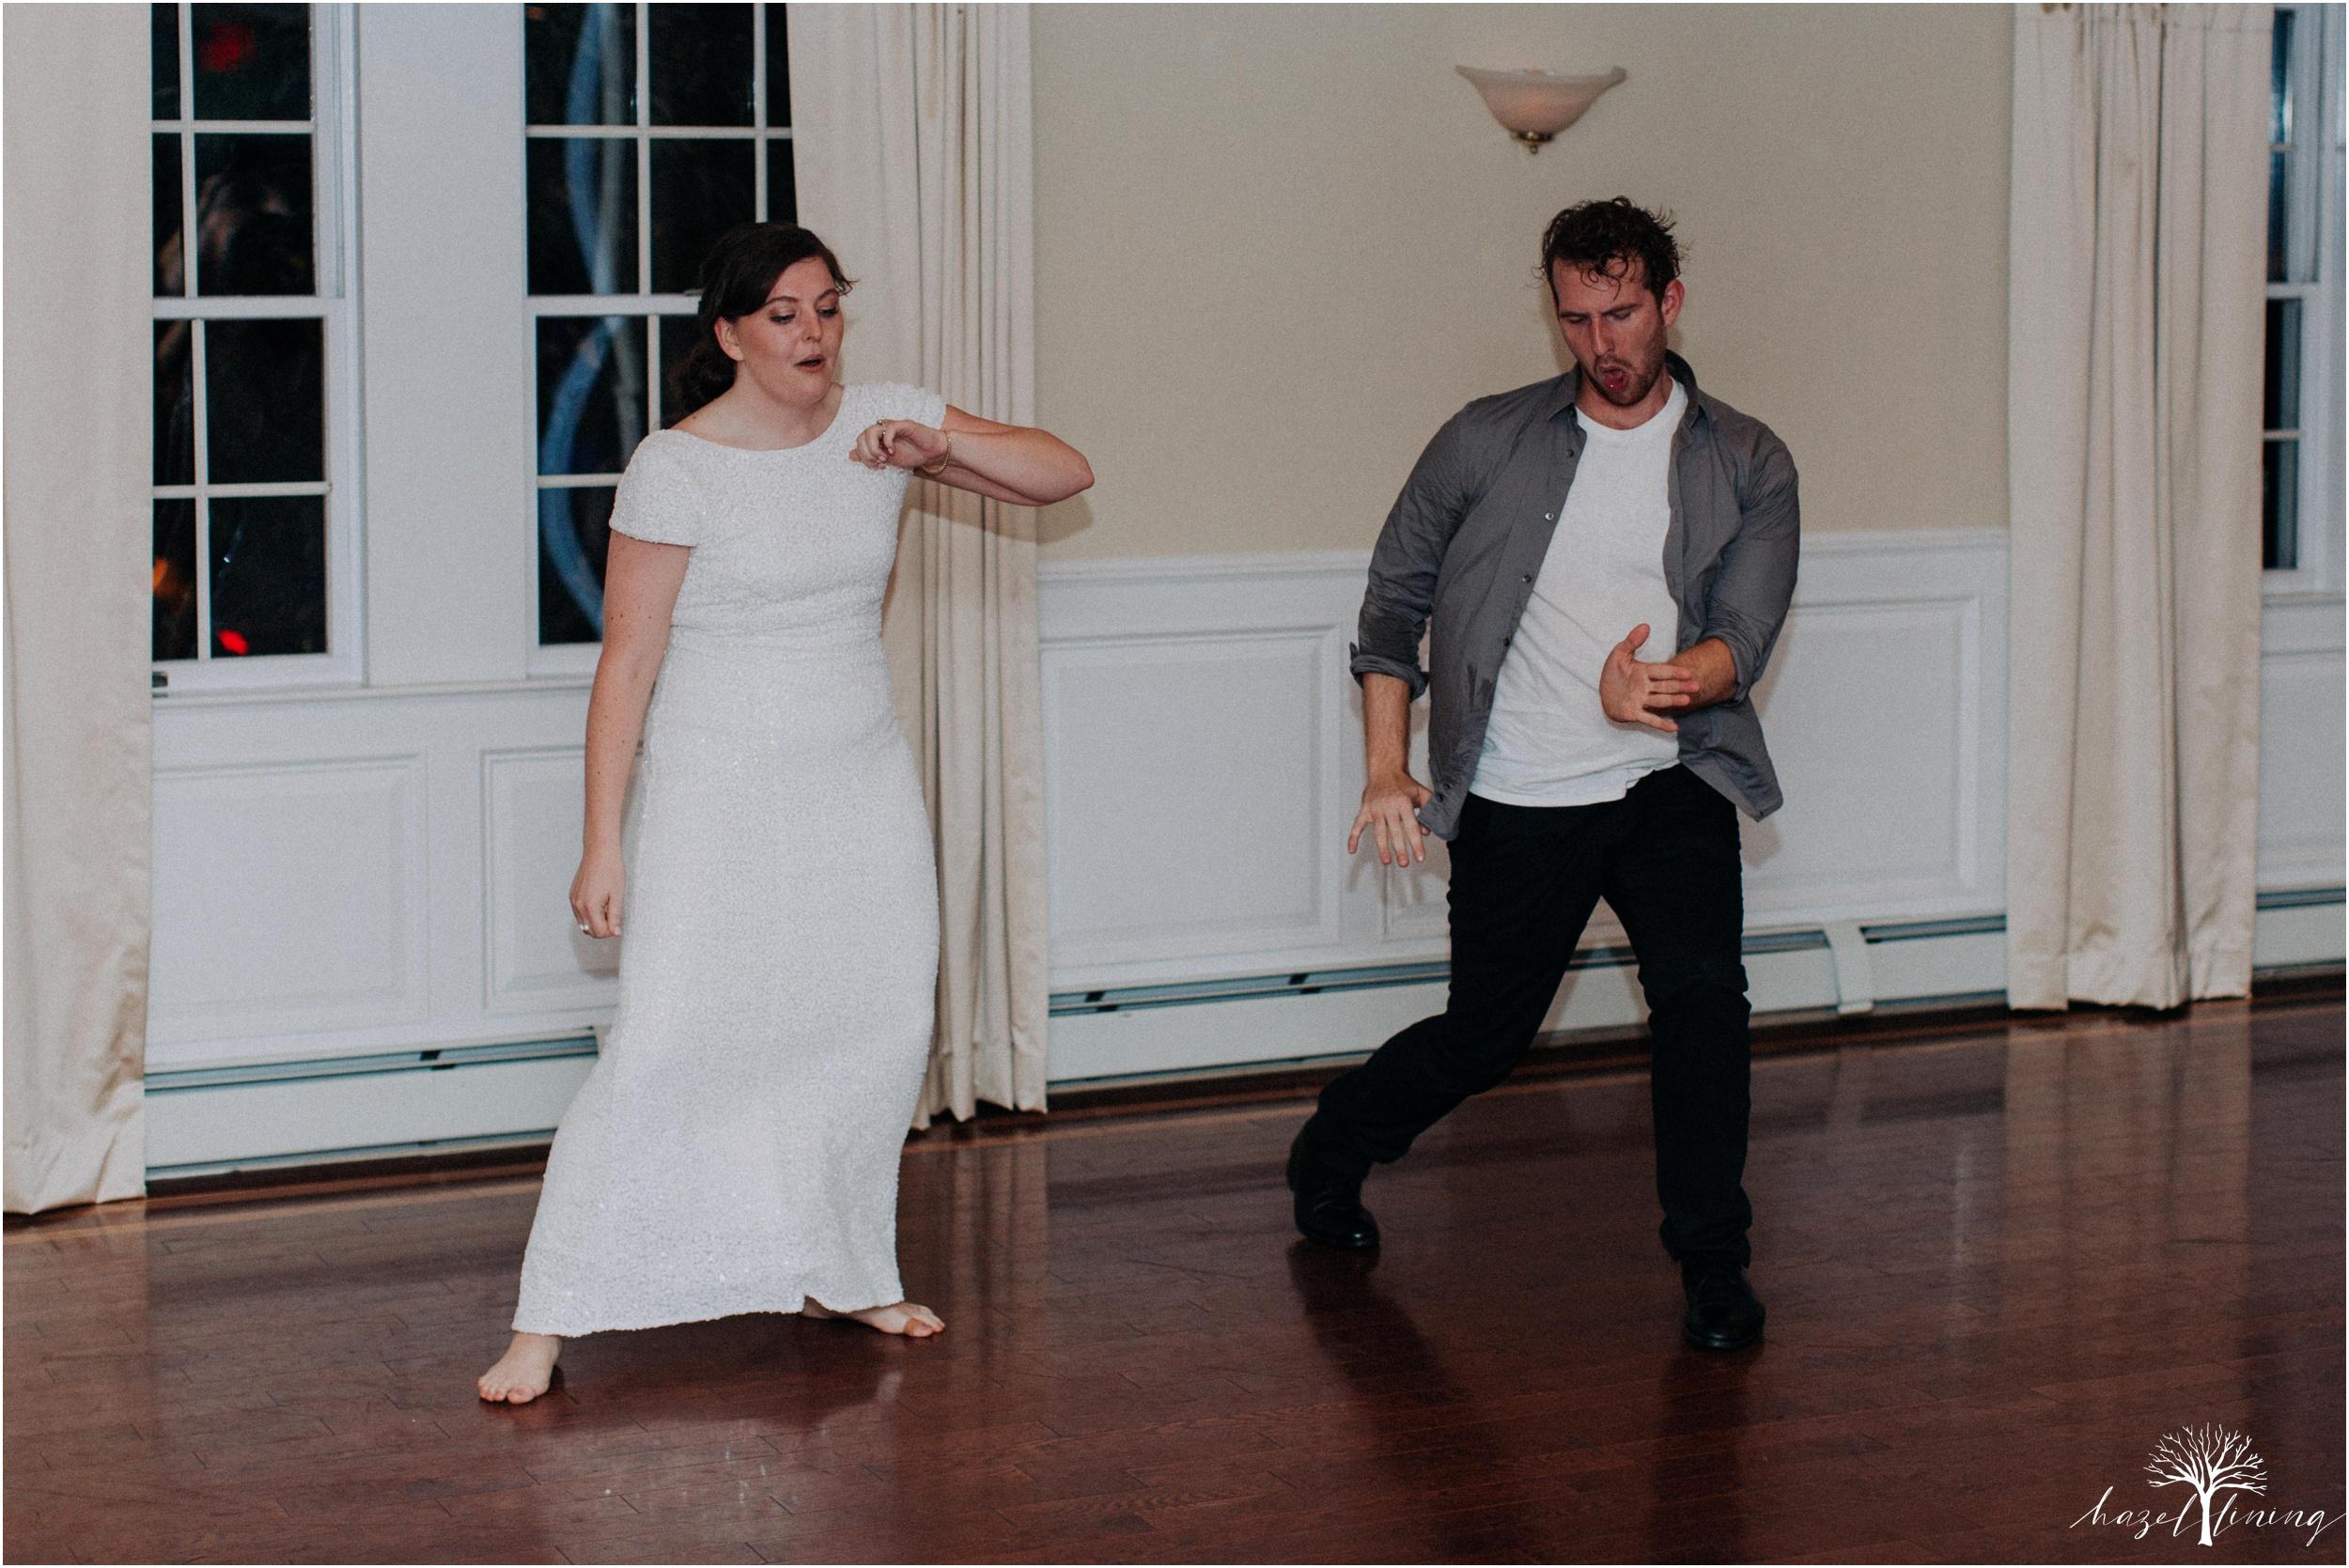 elizabeth-doelp-andrew-foreback-middletown-country-club-summer-langhorne-pennsylvania-wedding-hazel-lining-travel-wedding-elopement-photography_0166.jpg